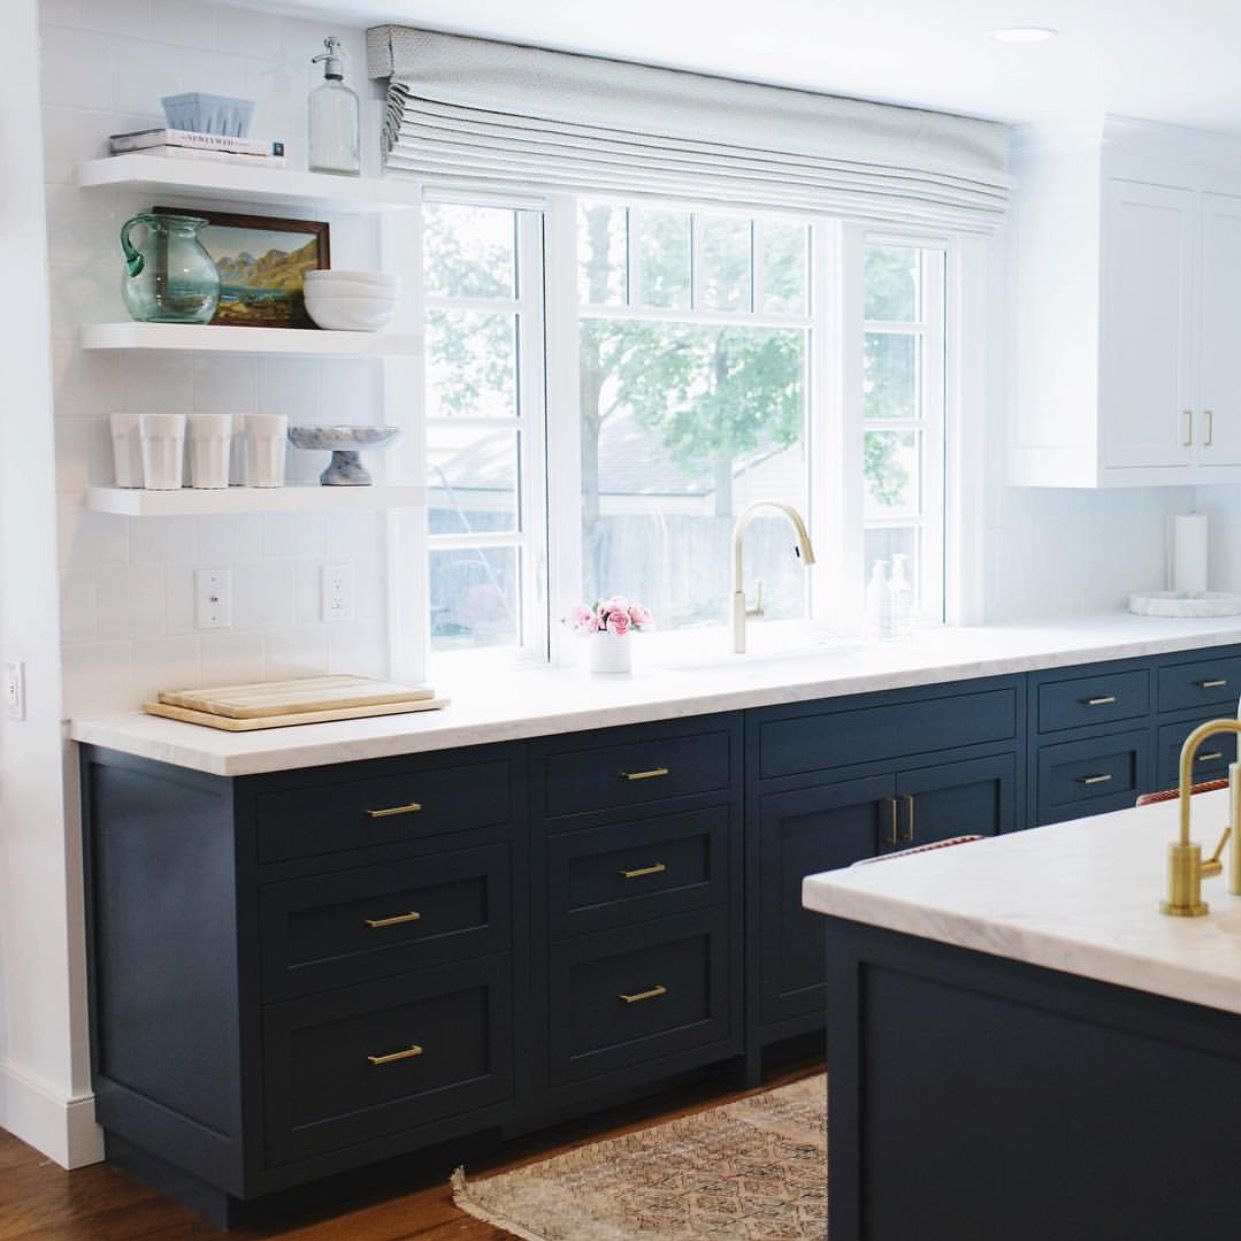 Two Tone Kitchen Cabinets Ikea: Pin By Heidi Bennett Cooper On Studio McGee